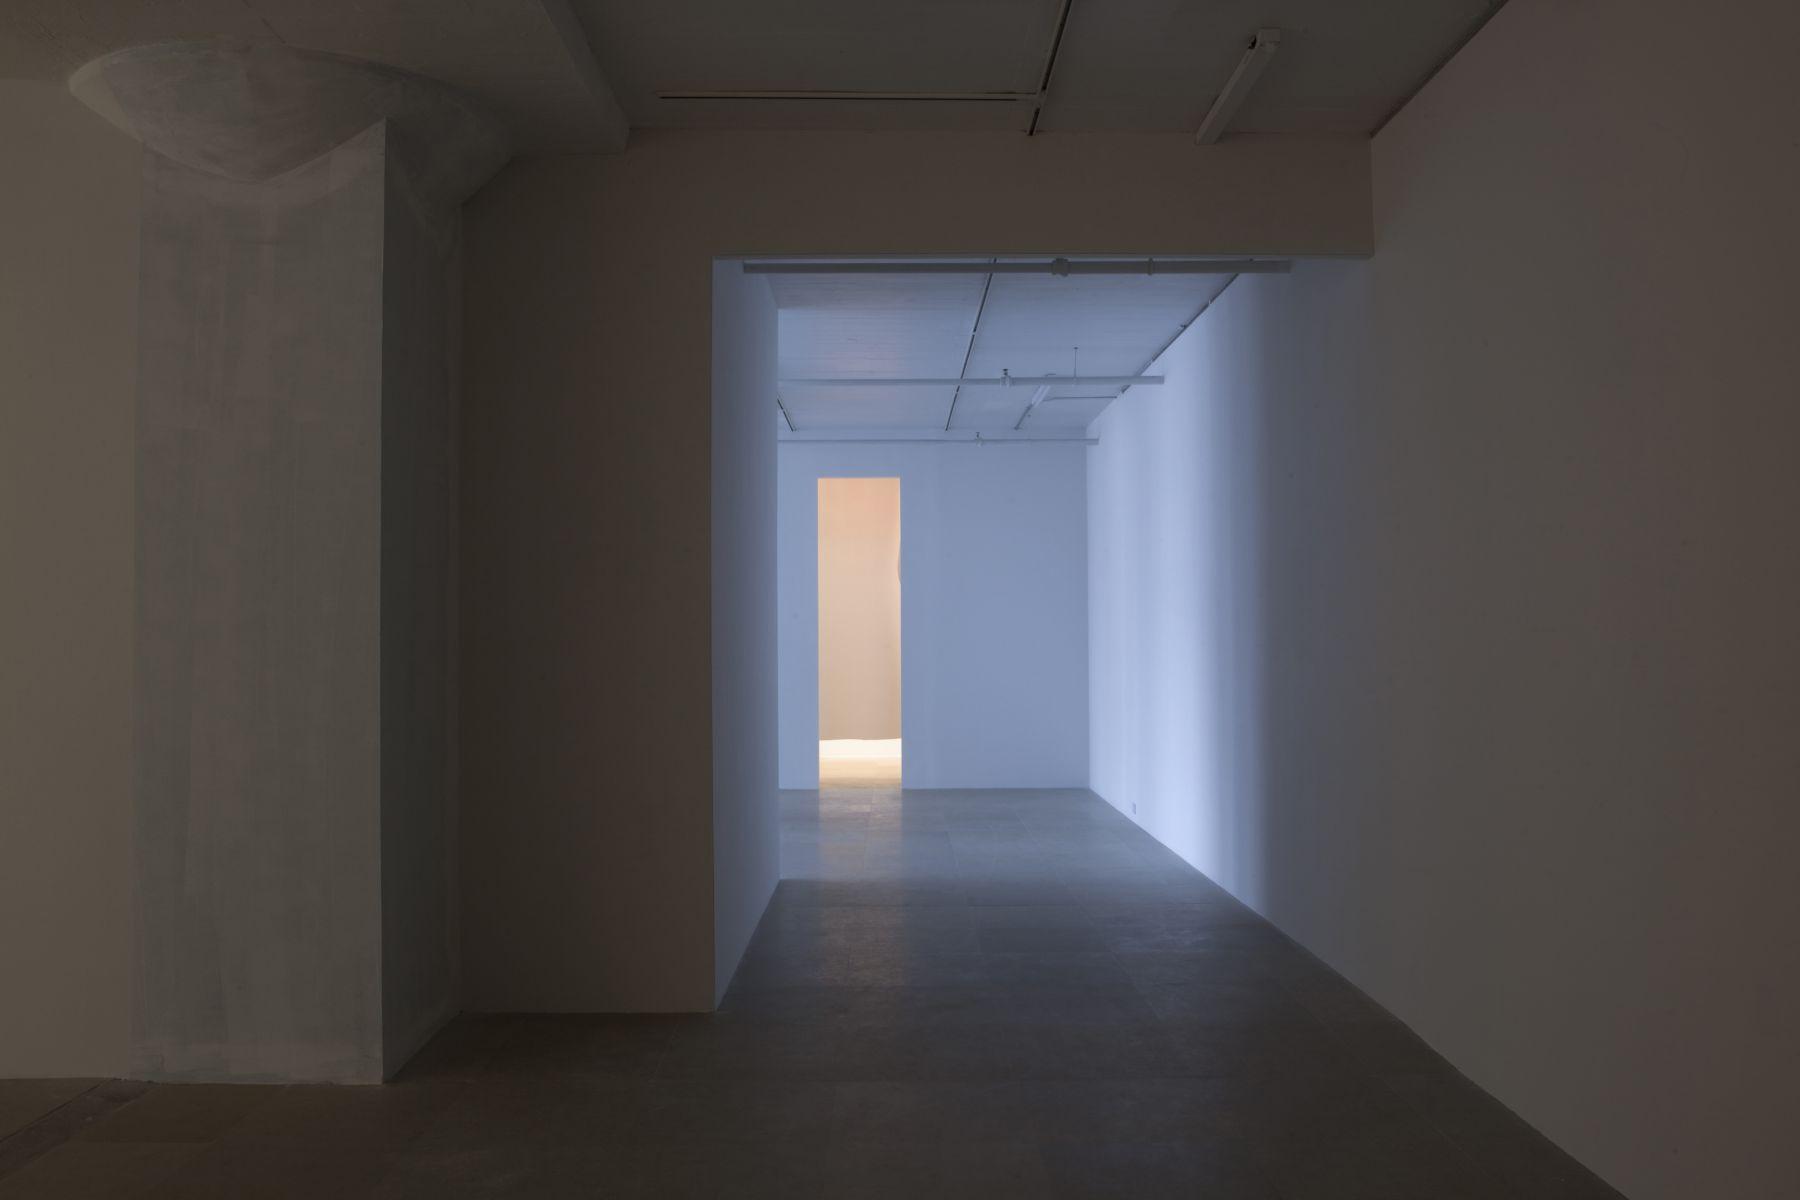 Gedi Sibony, Installation view, Greene Naftali, New York, 2010